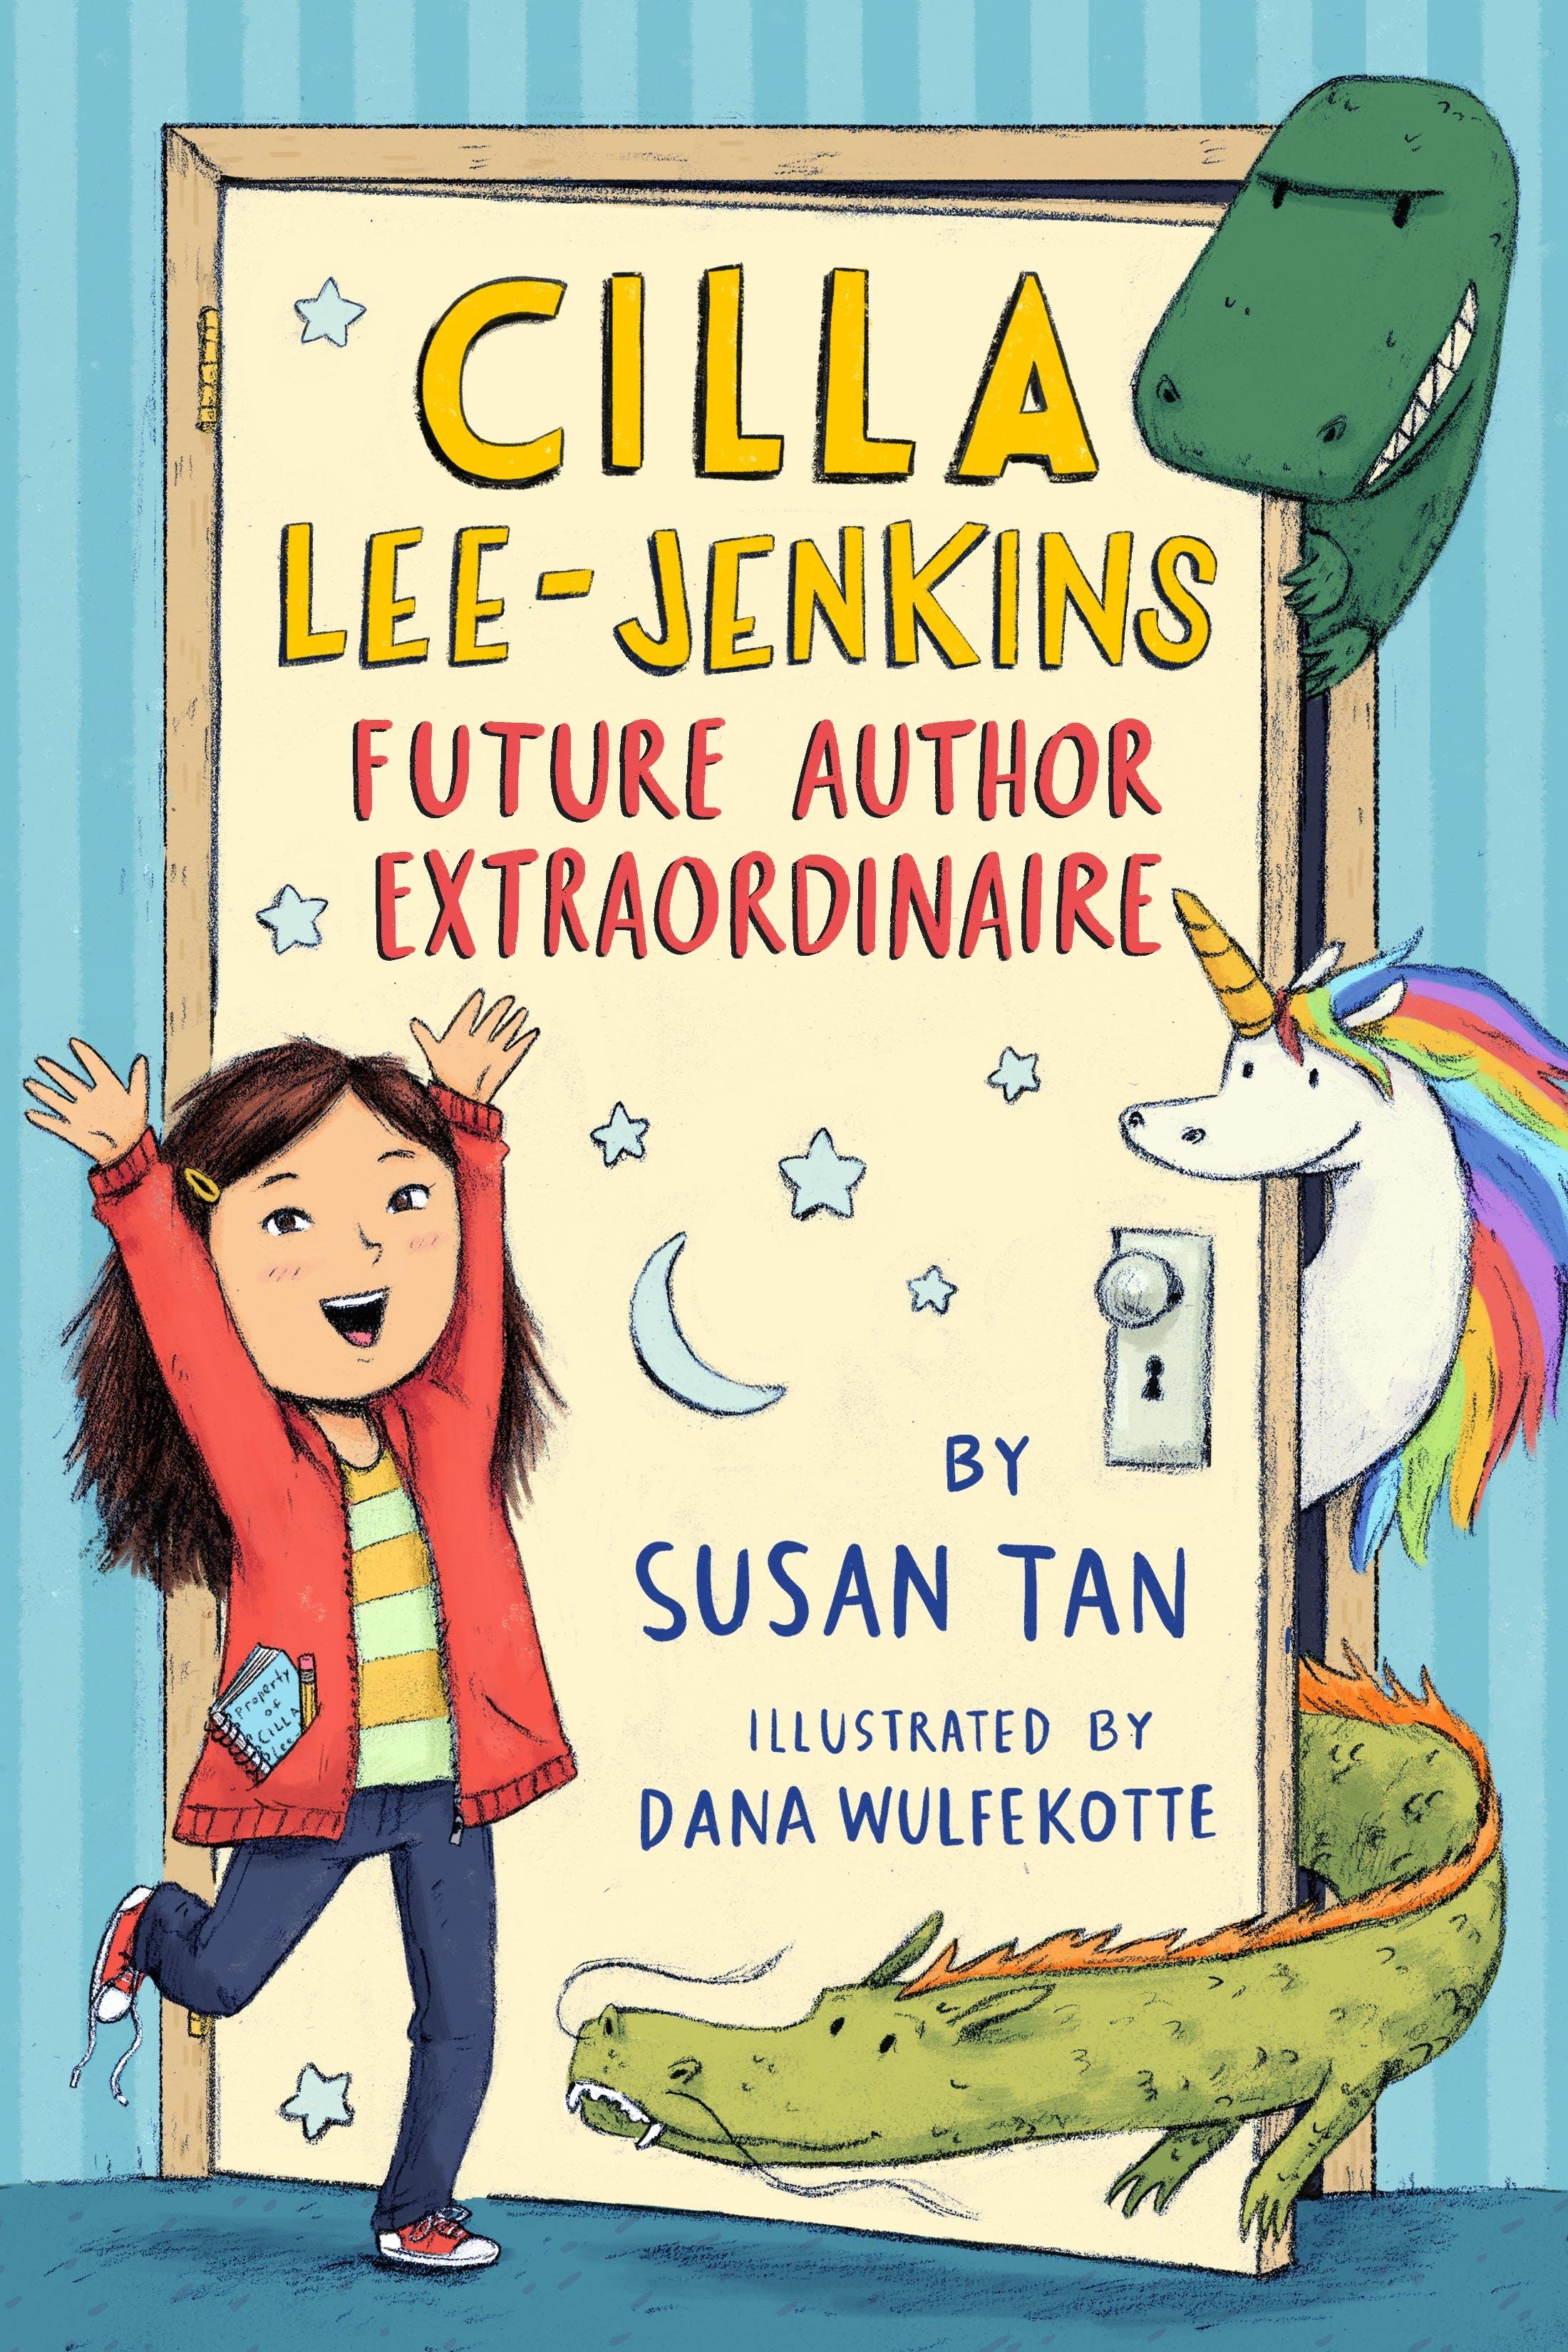 Image of Cilla Lee-Jenkins: Future Author Extraordinaire